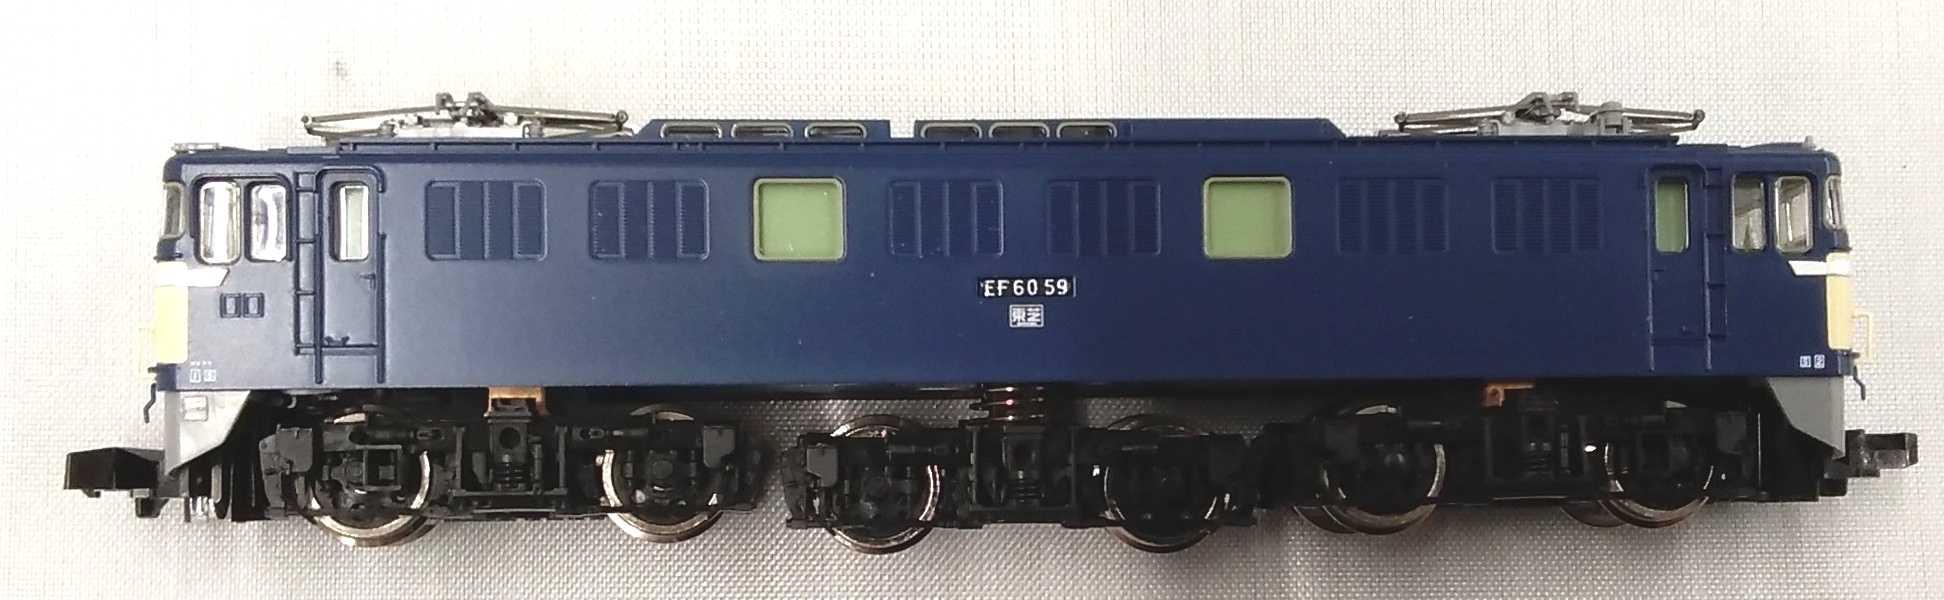 Nゲージ車両電気機関車|TOMIX